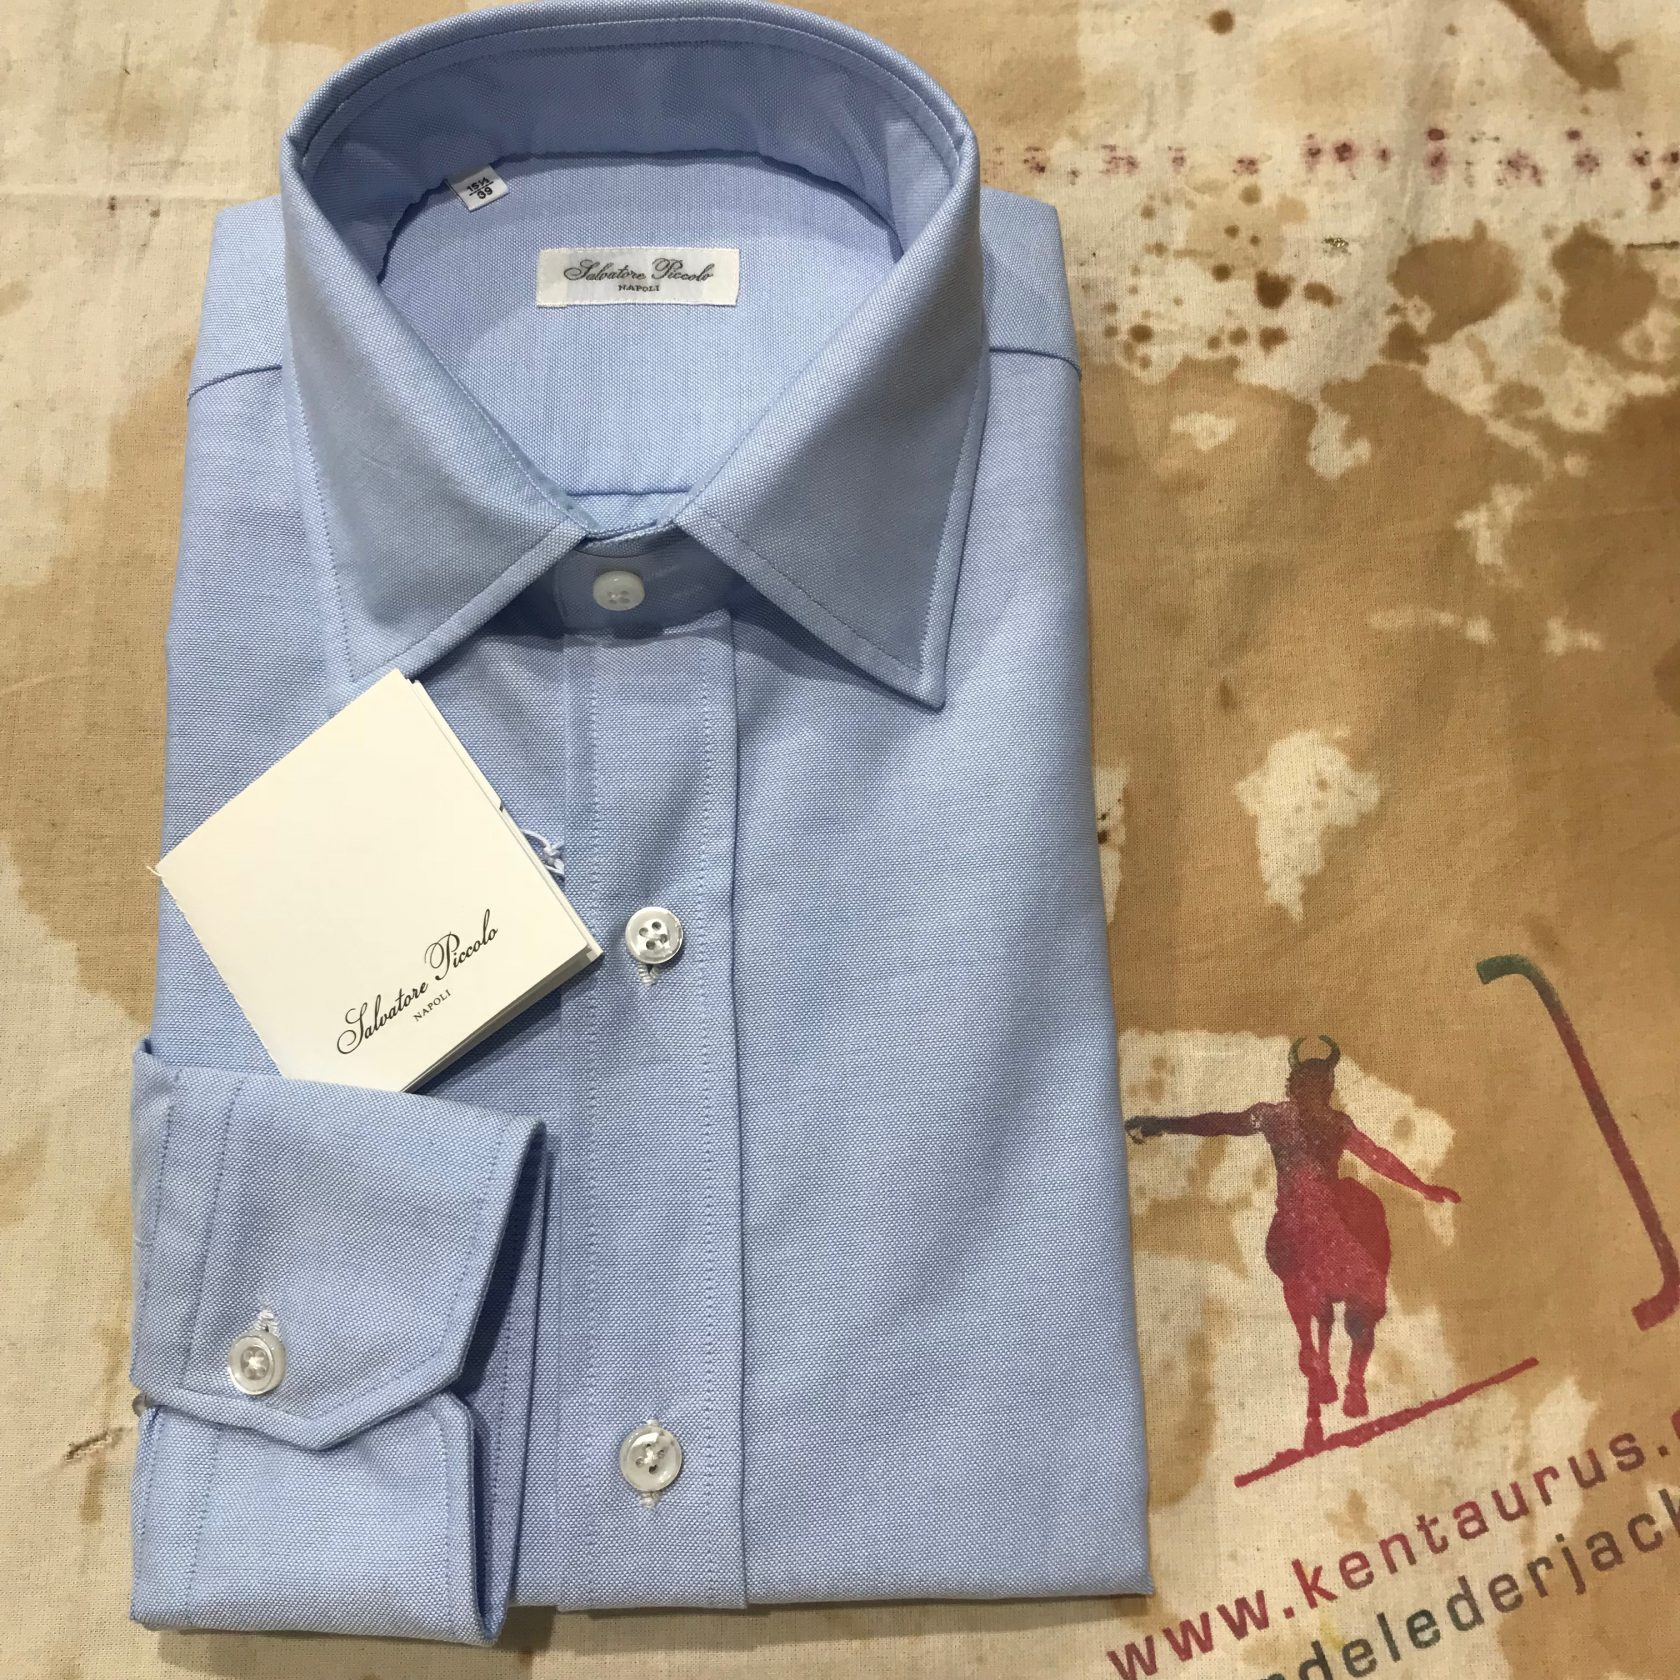 S.Piccolo plain blue oxford shirt